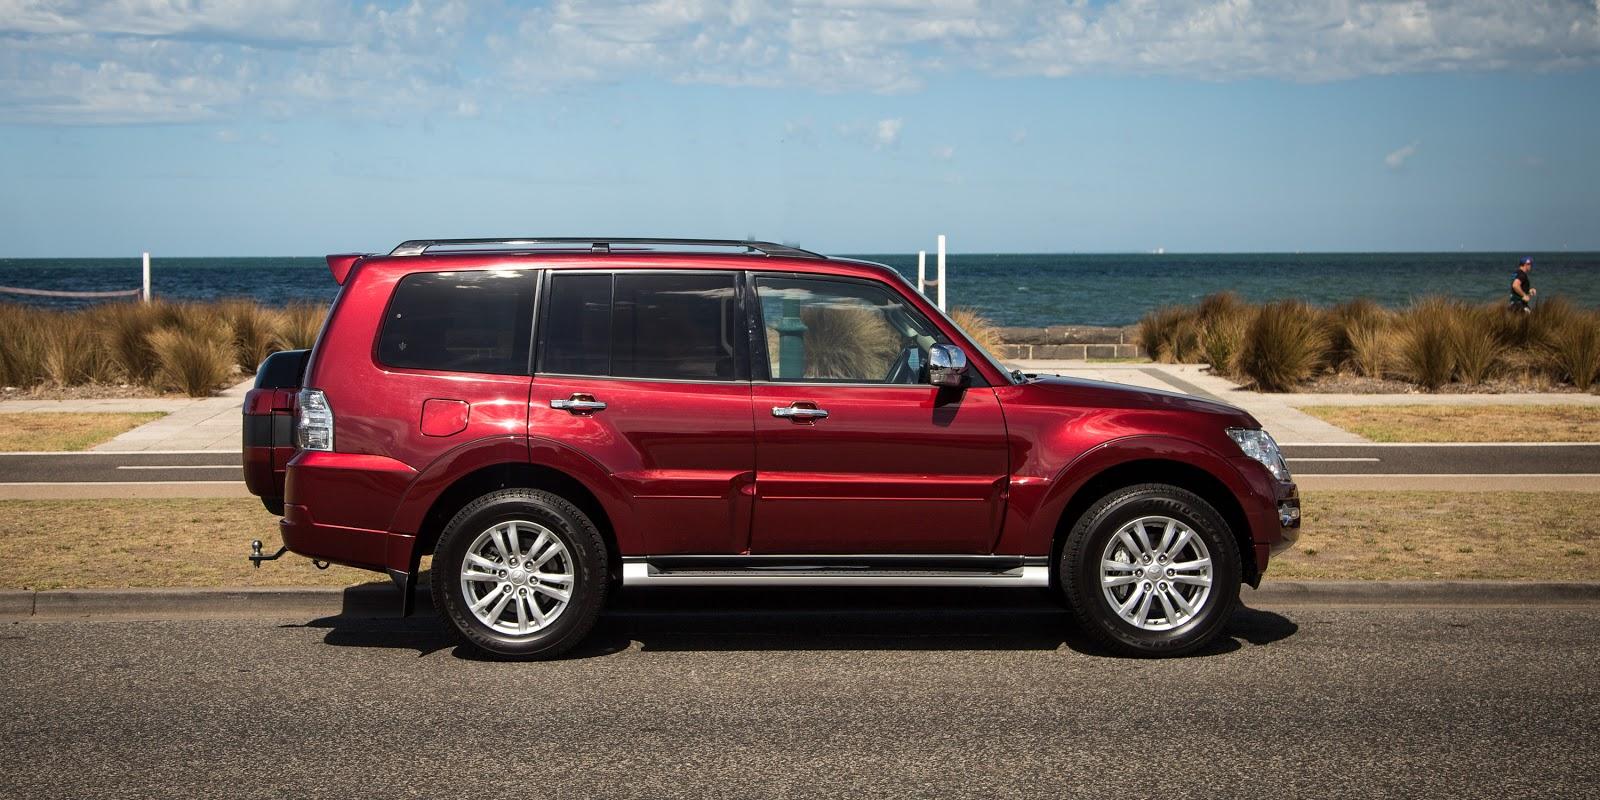 Đánh giá xe Mitsubishi Pajero 2016 - SUV huyền thoại